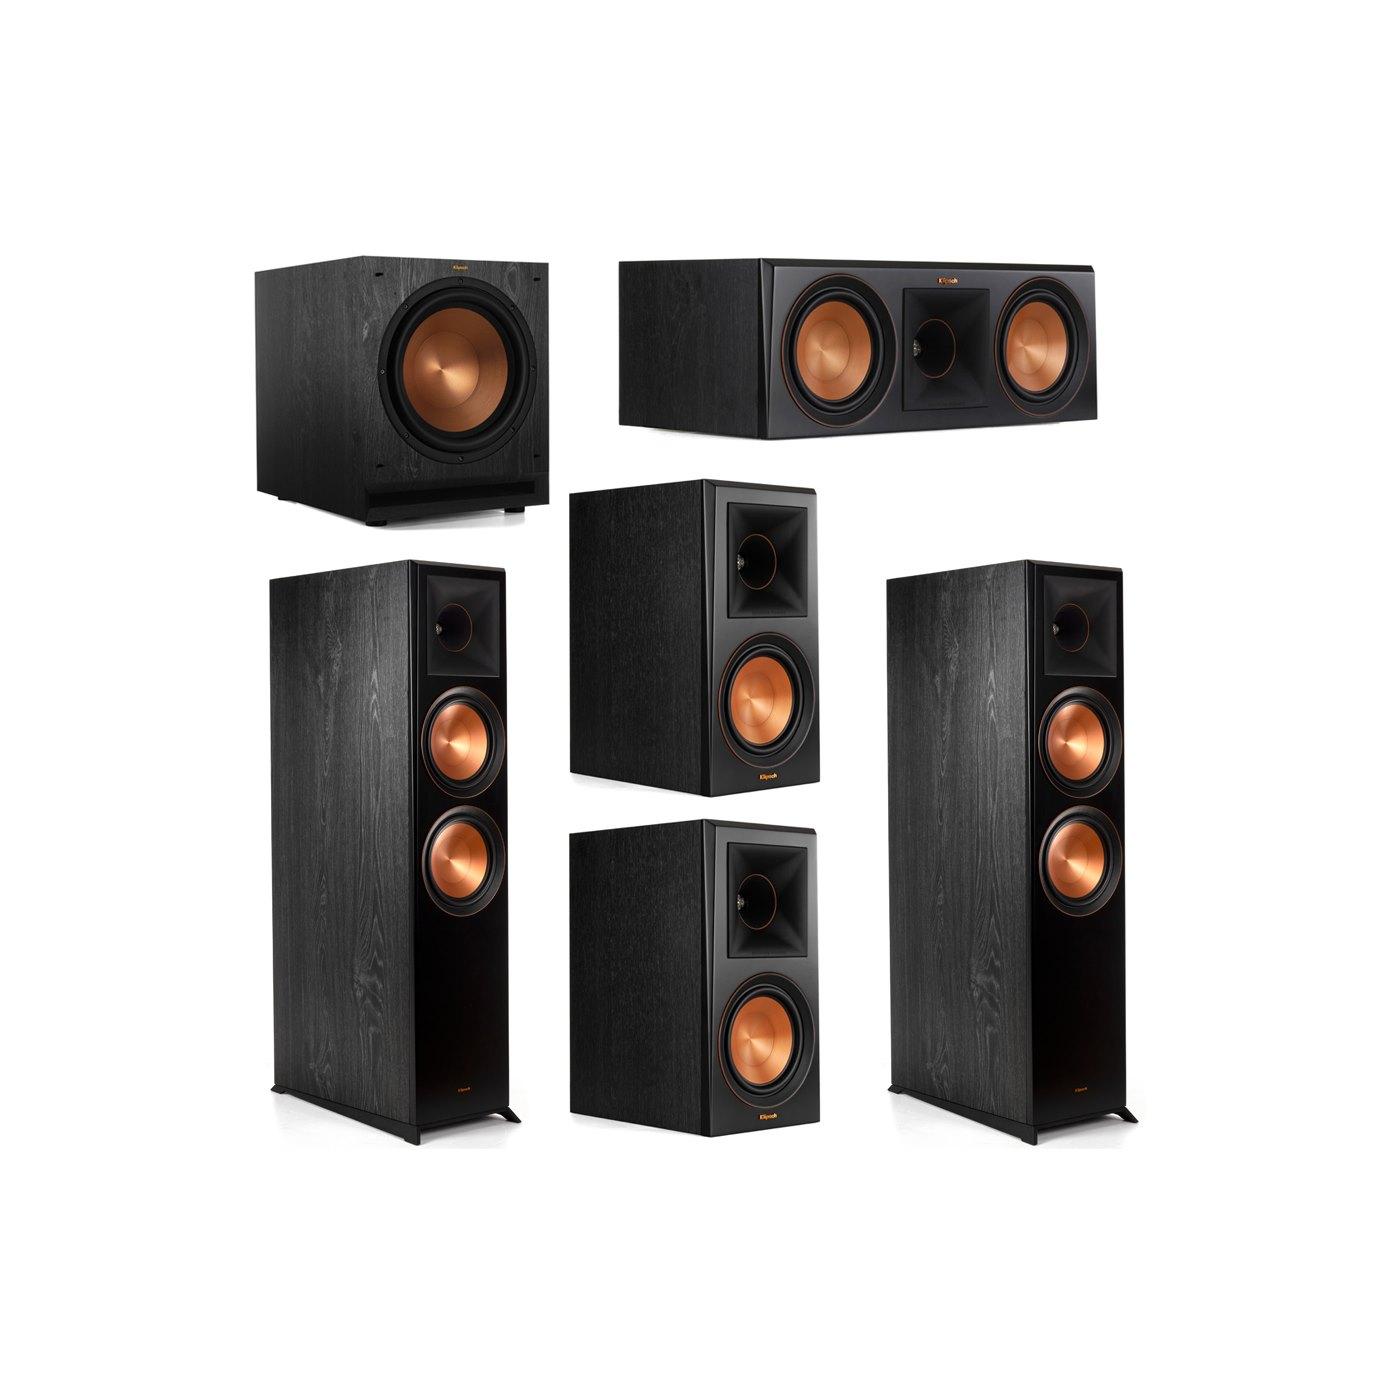 Klipsch 5.1 System with 2 RP-8000F Floorstanding Speakers, 1 Klipsch RP-600C Center Speaker, 2 Klipsch RP-600M Surround Speakers, 1 Klipsch SPL-120 Subwoofer